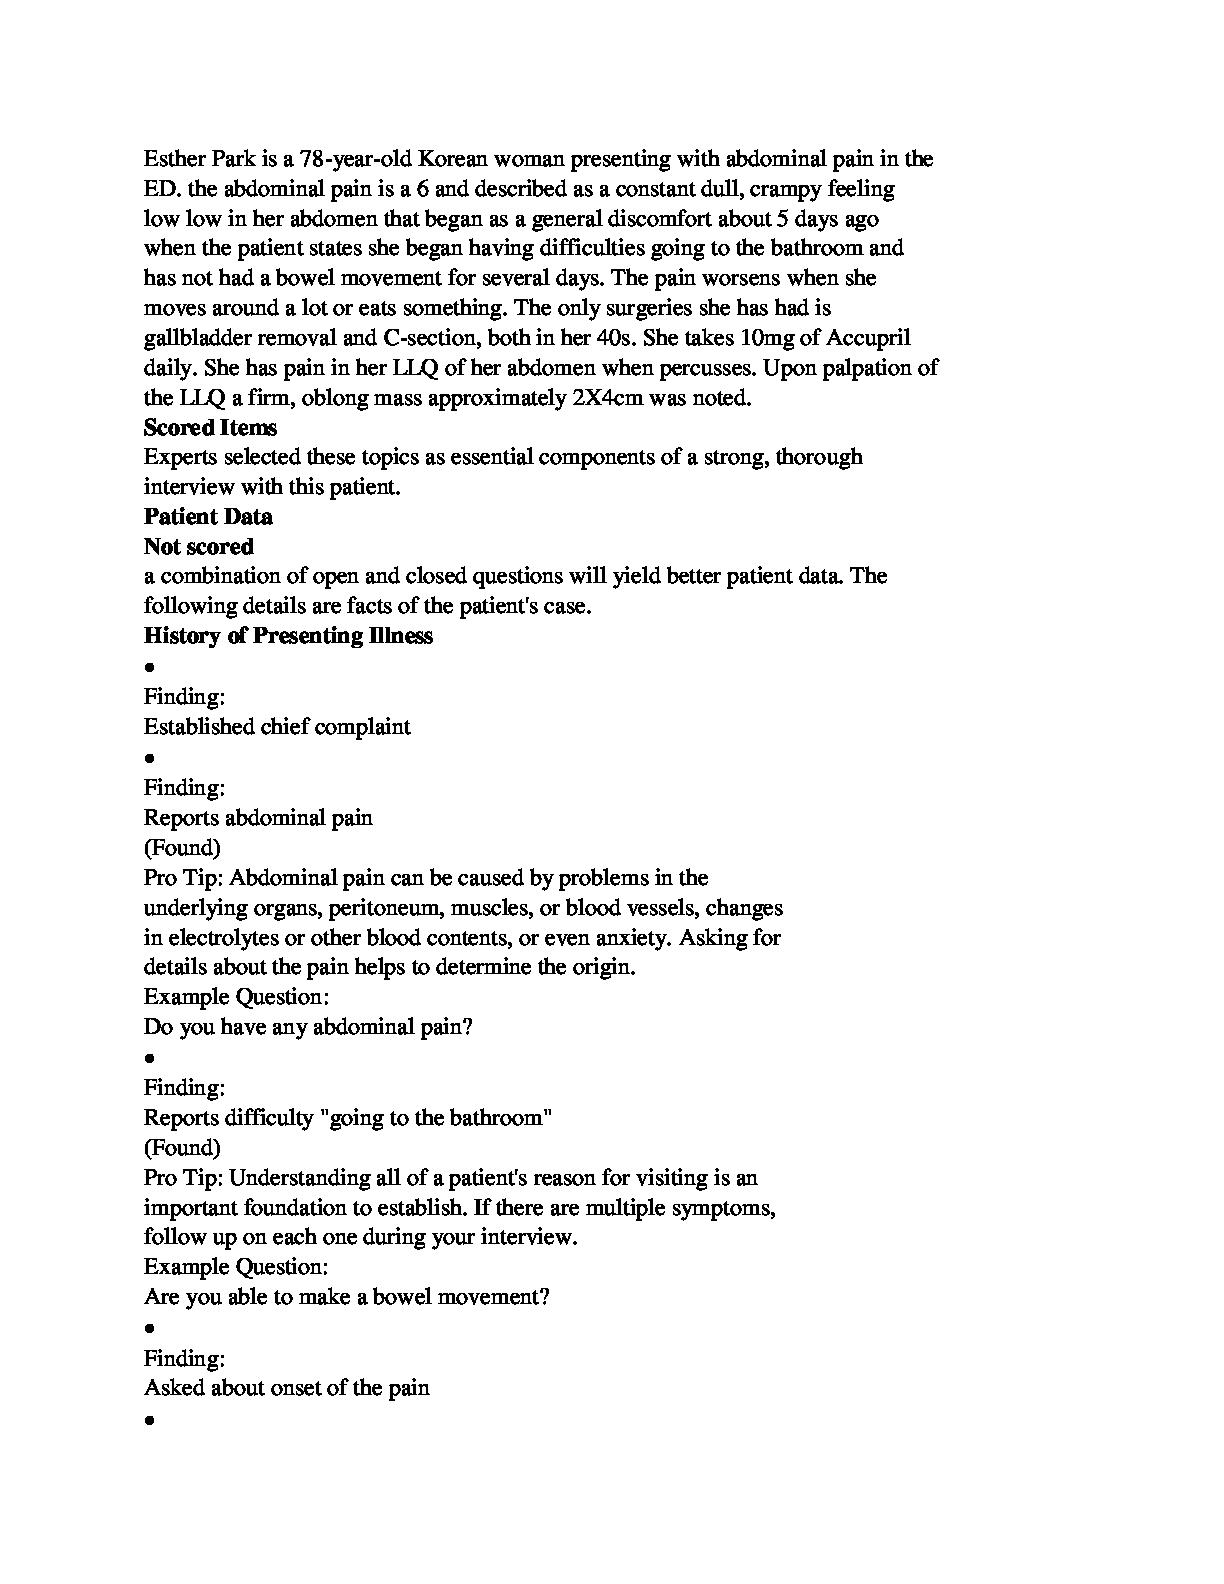 Pin On Exam [ 1584 x 1224 Pixel ]